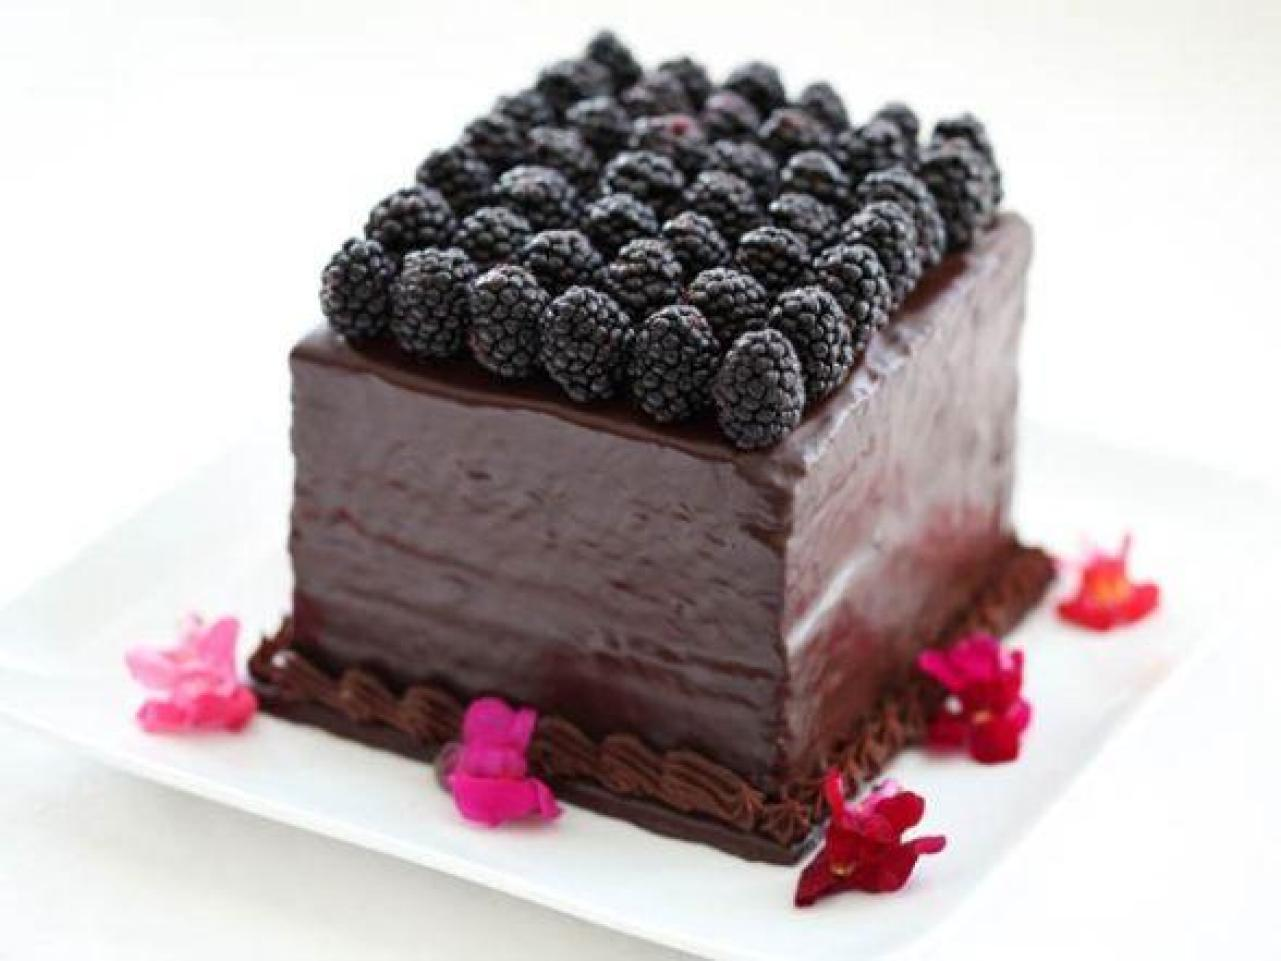 Chocolate Cake Recipes With Almond Flour